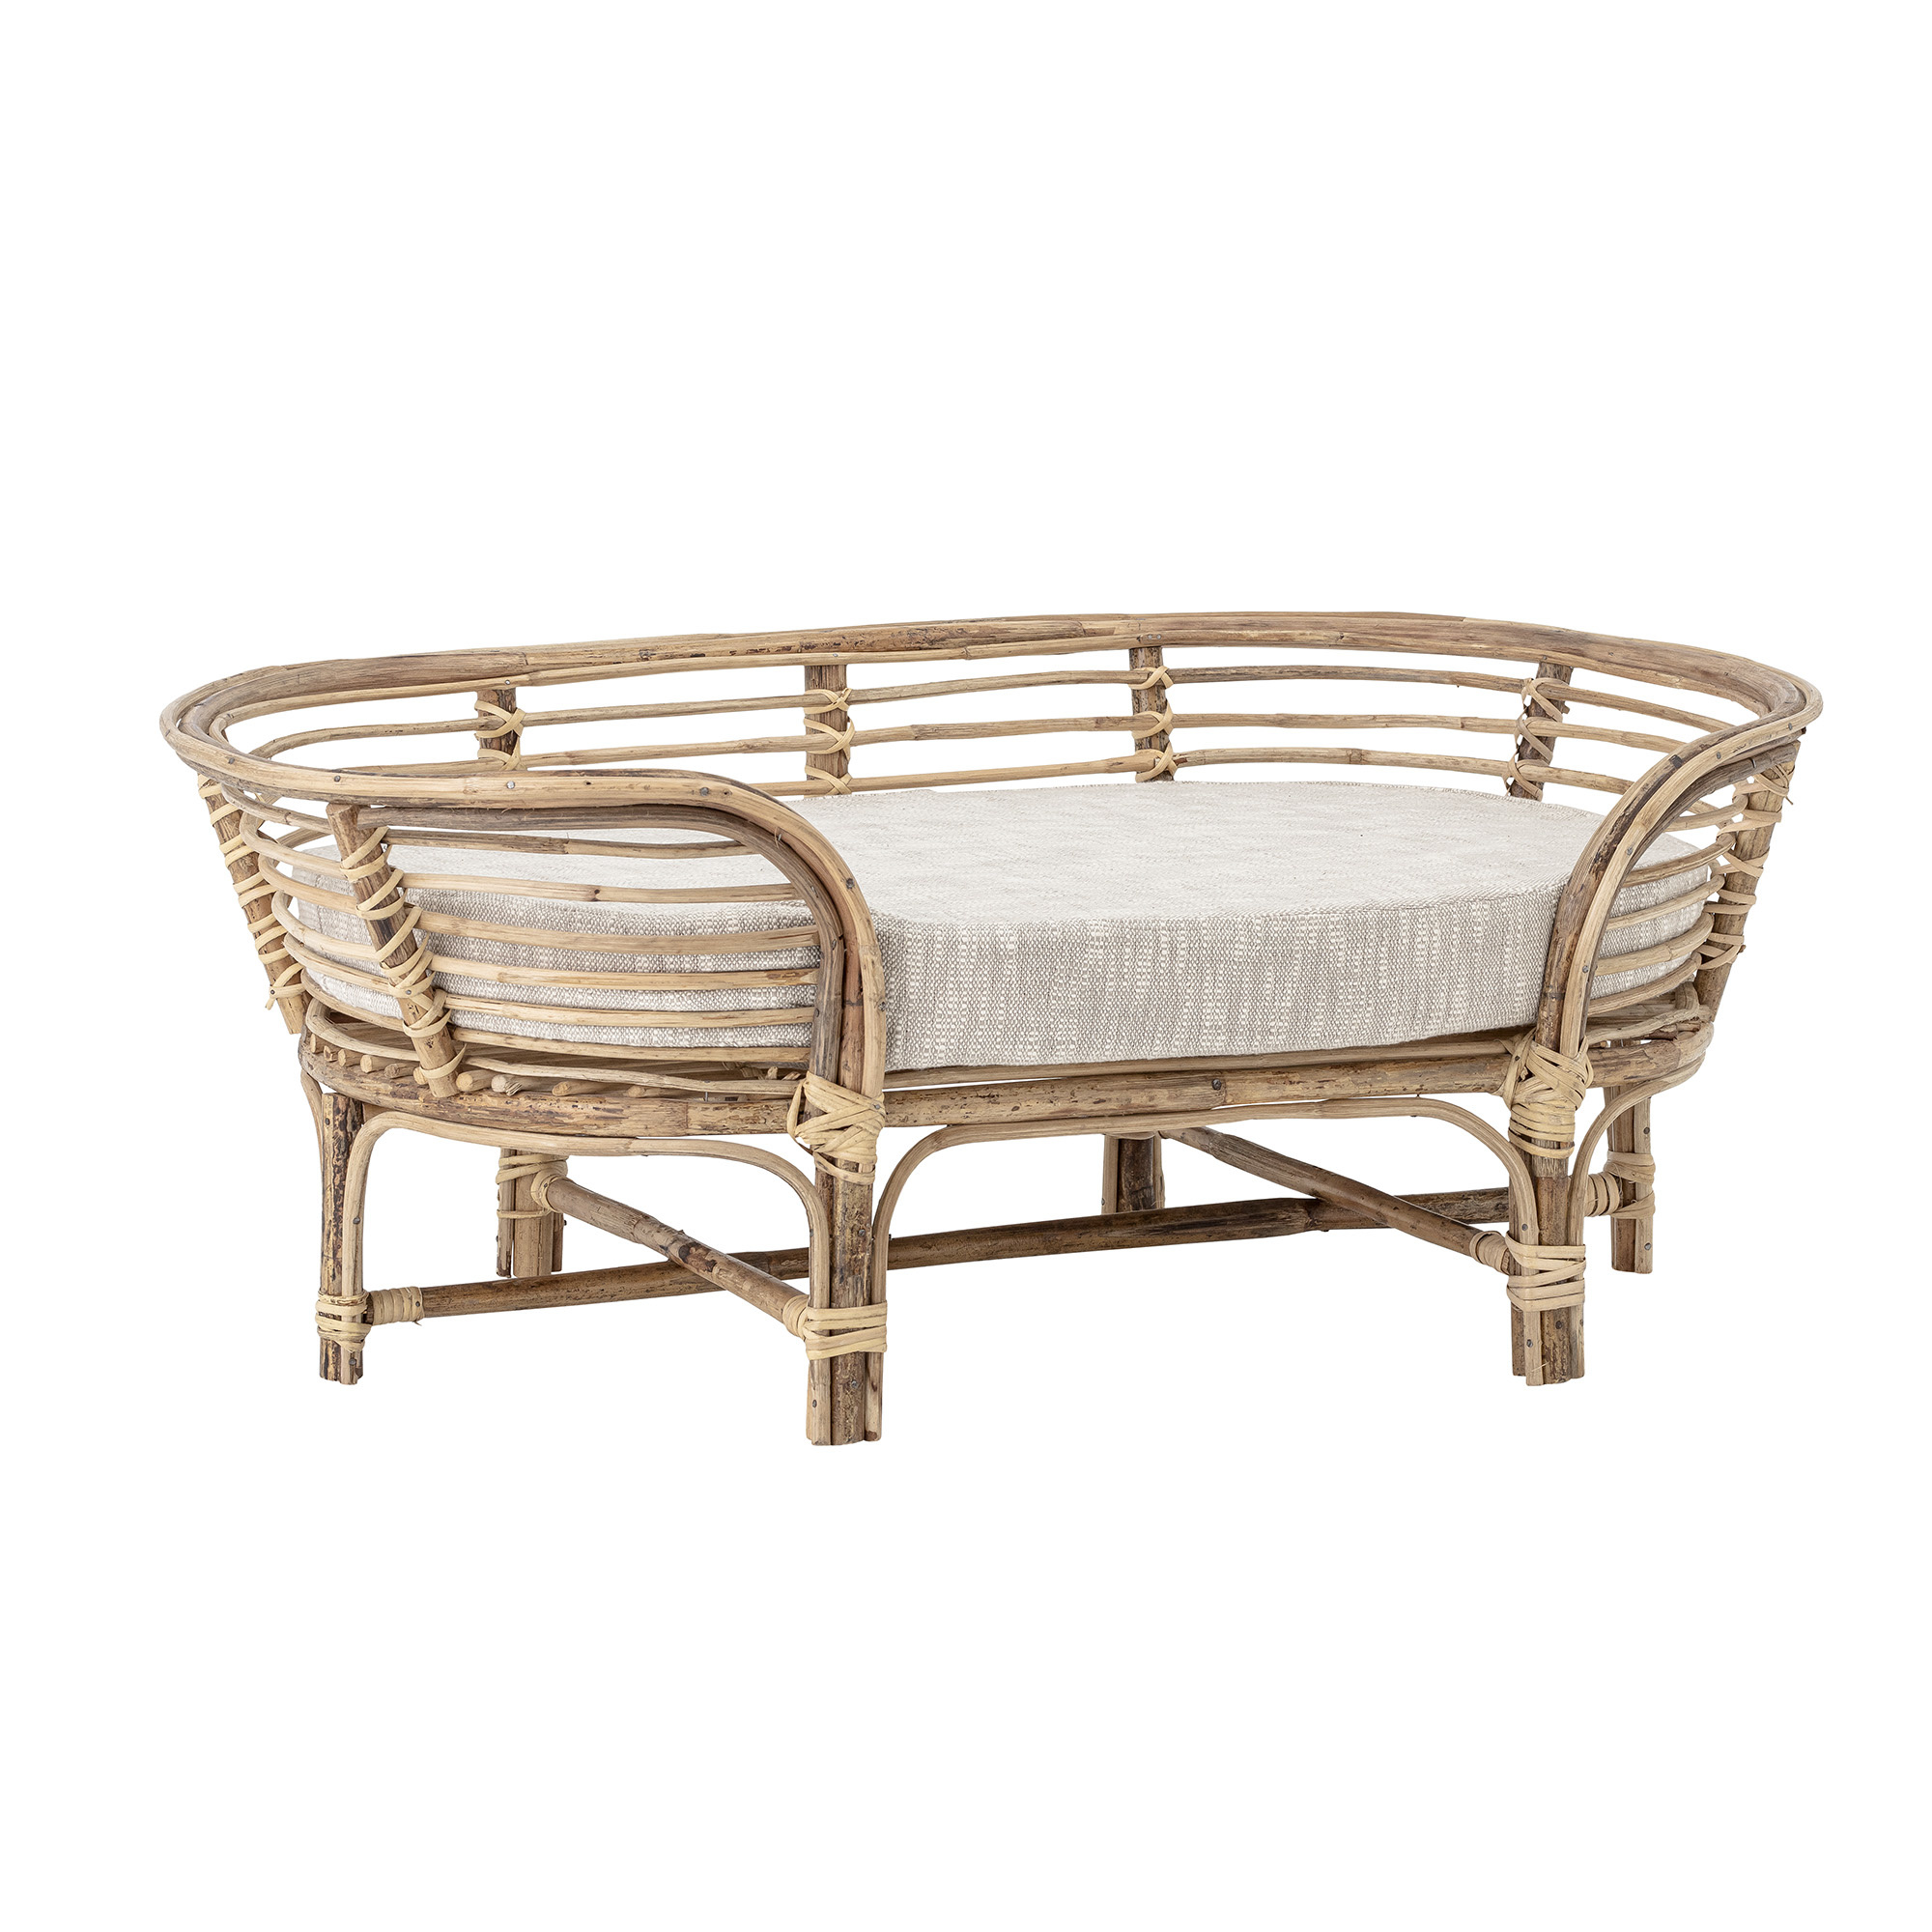 Bloomingville Dog Basket, Nature, Cane - L91xH34xW53cm - Bloomingville